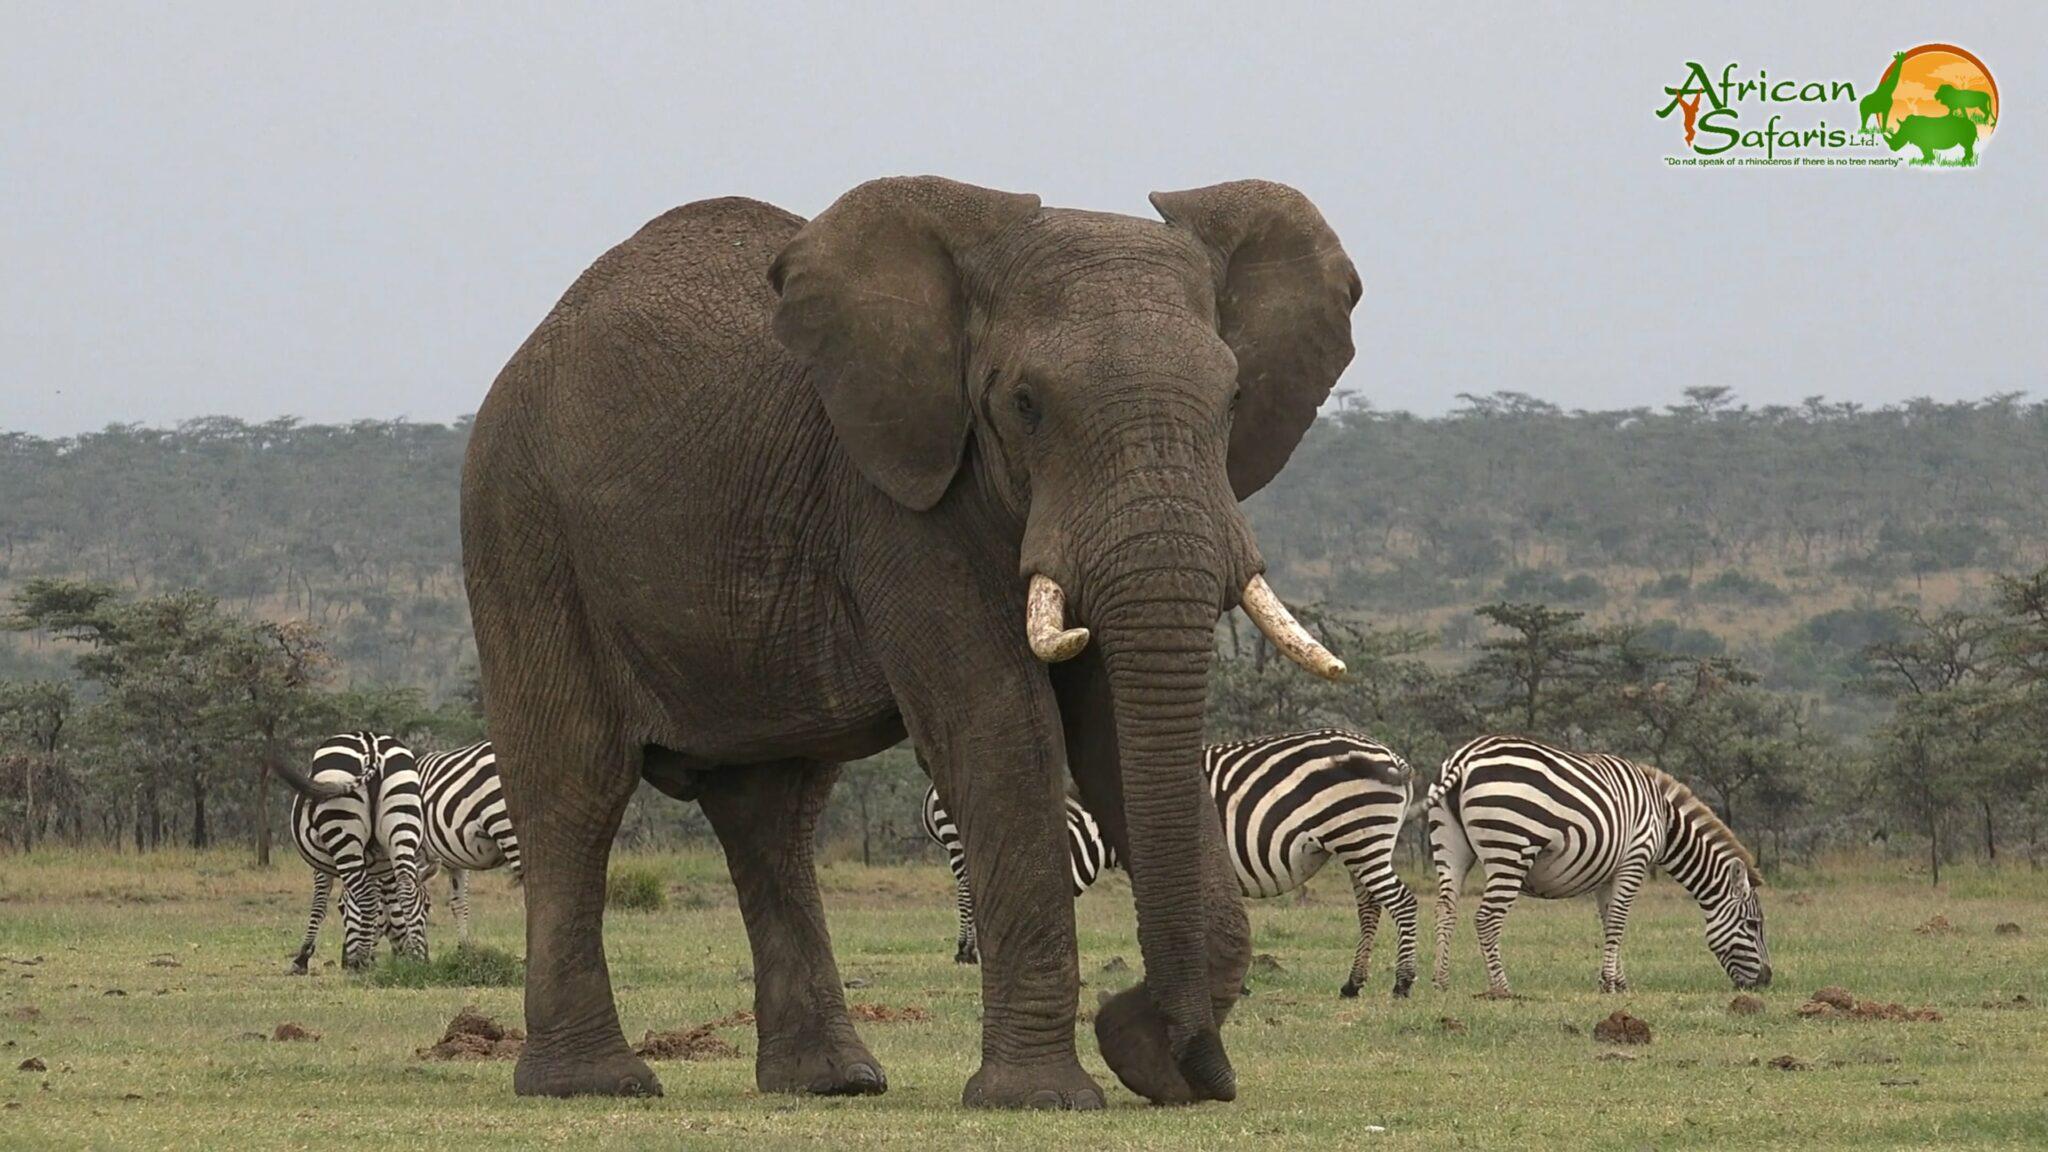 Elephants of Ol Pejeta Conservancy, Kenya